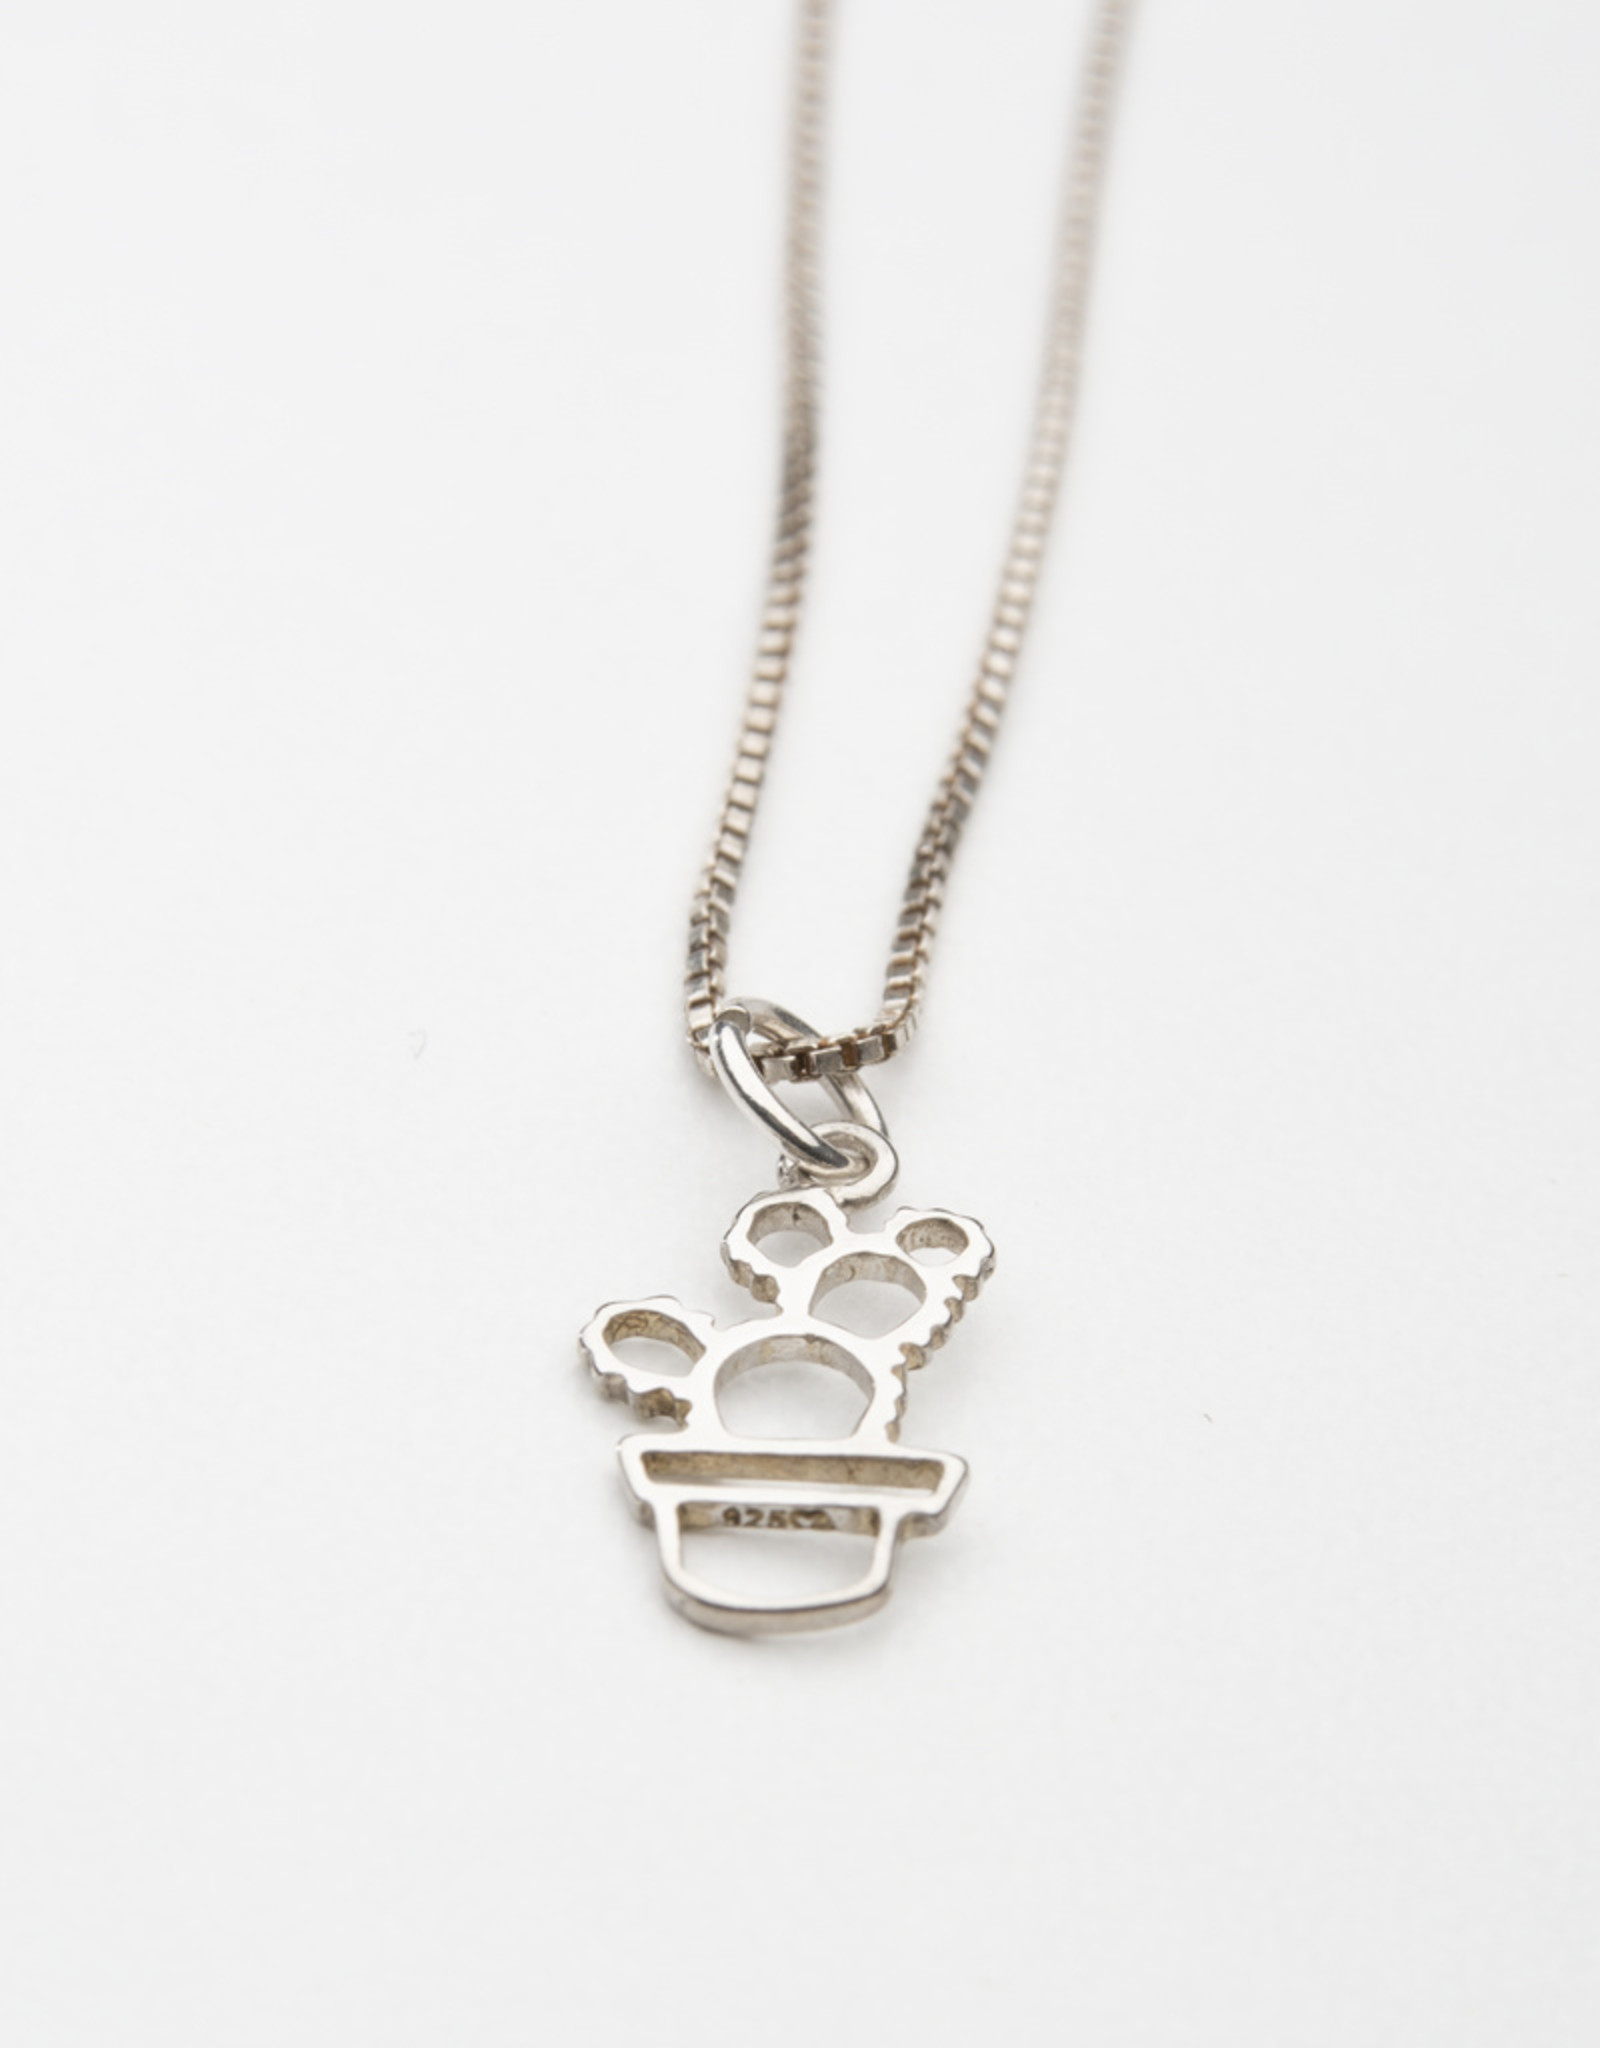 Dana Henning Silver Cactus Pendant Necklace